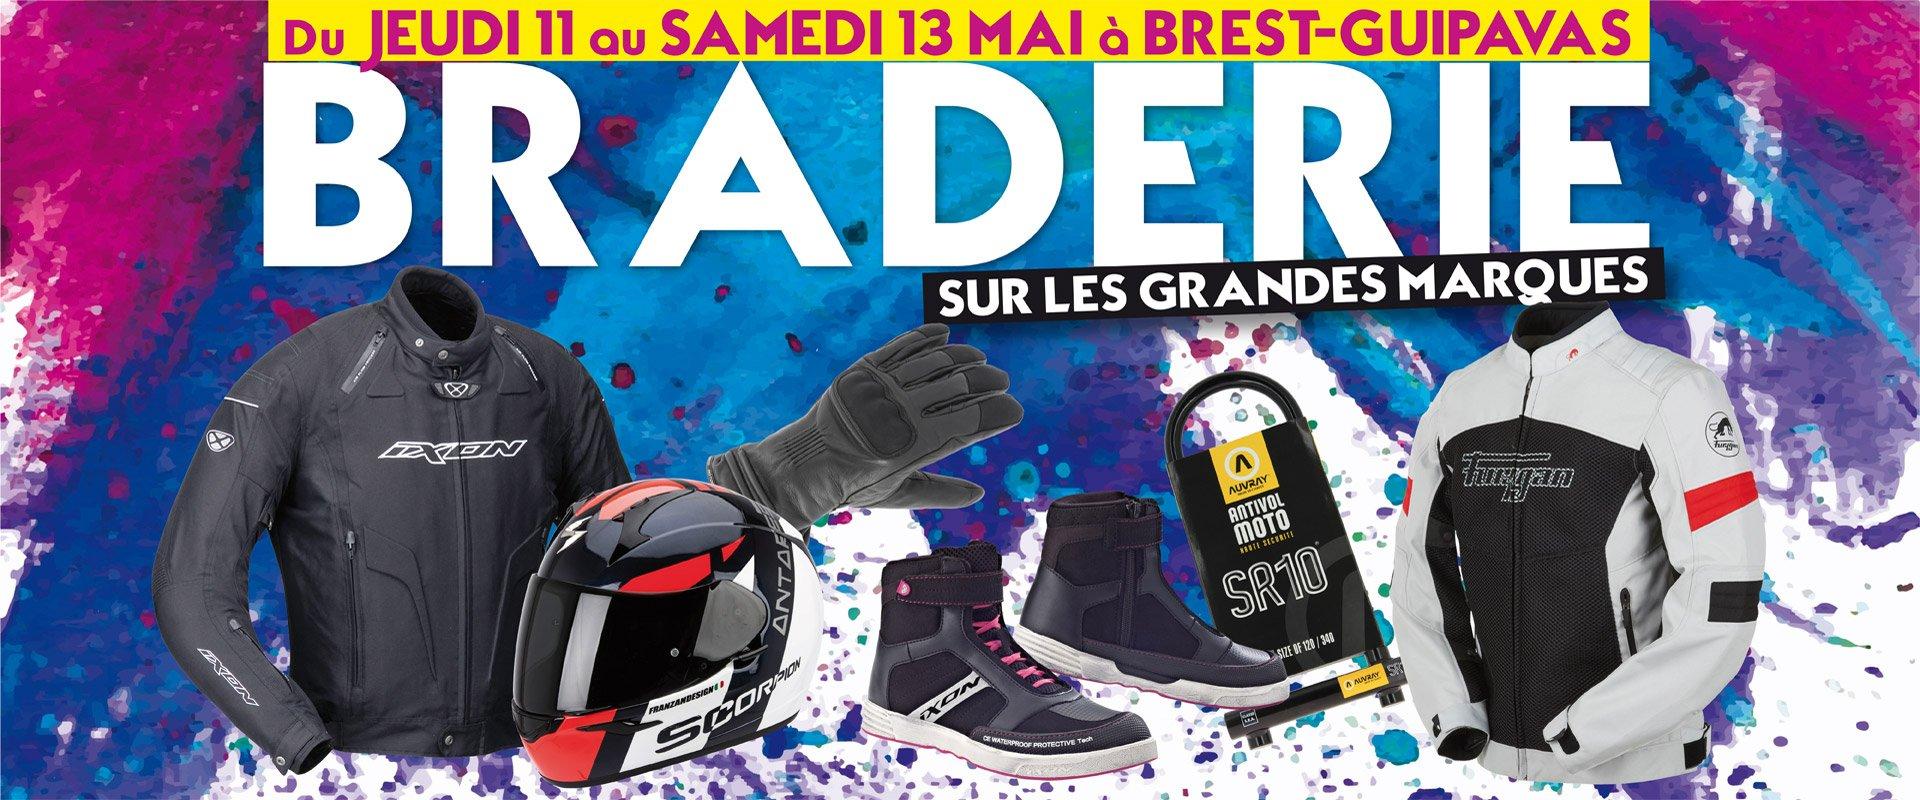 Braderie Cardy Brest